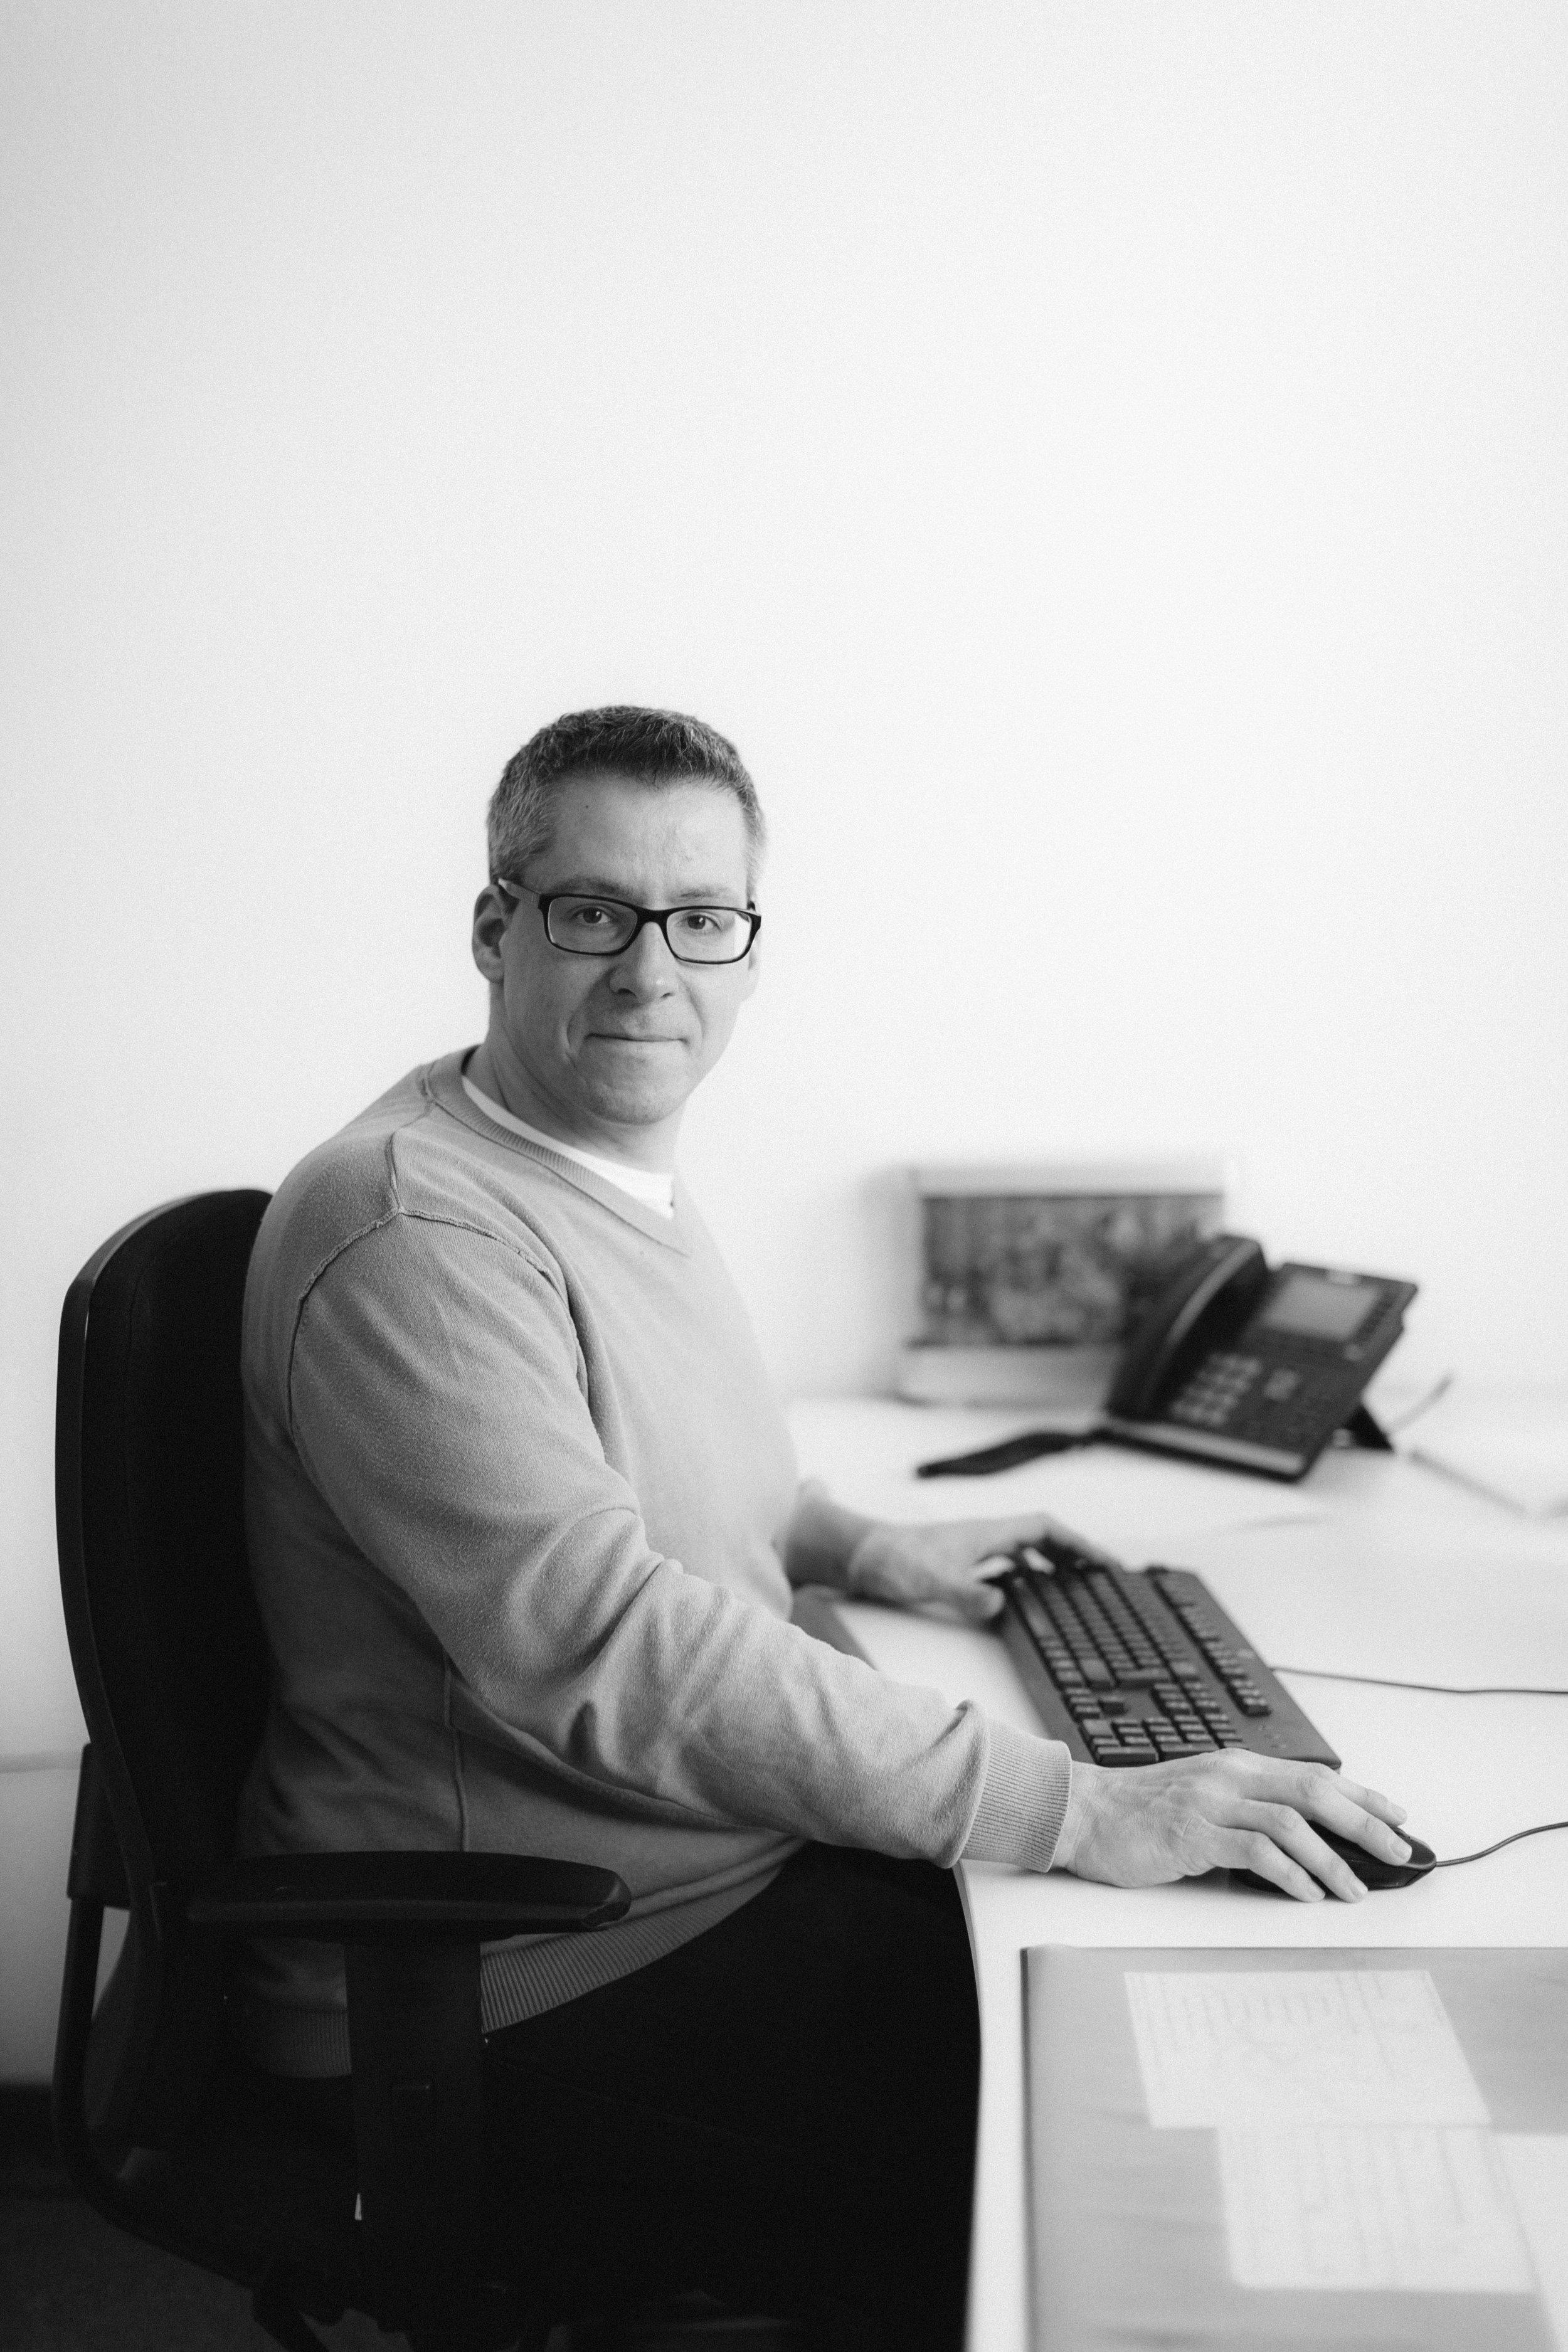 Markus Holtmannspötter - Personalabteilung